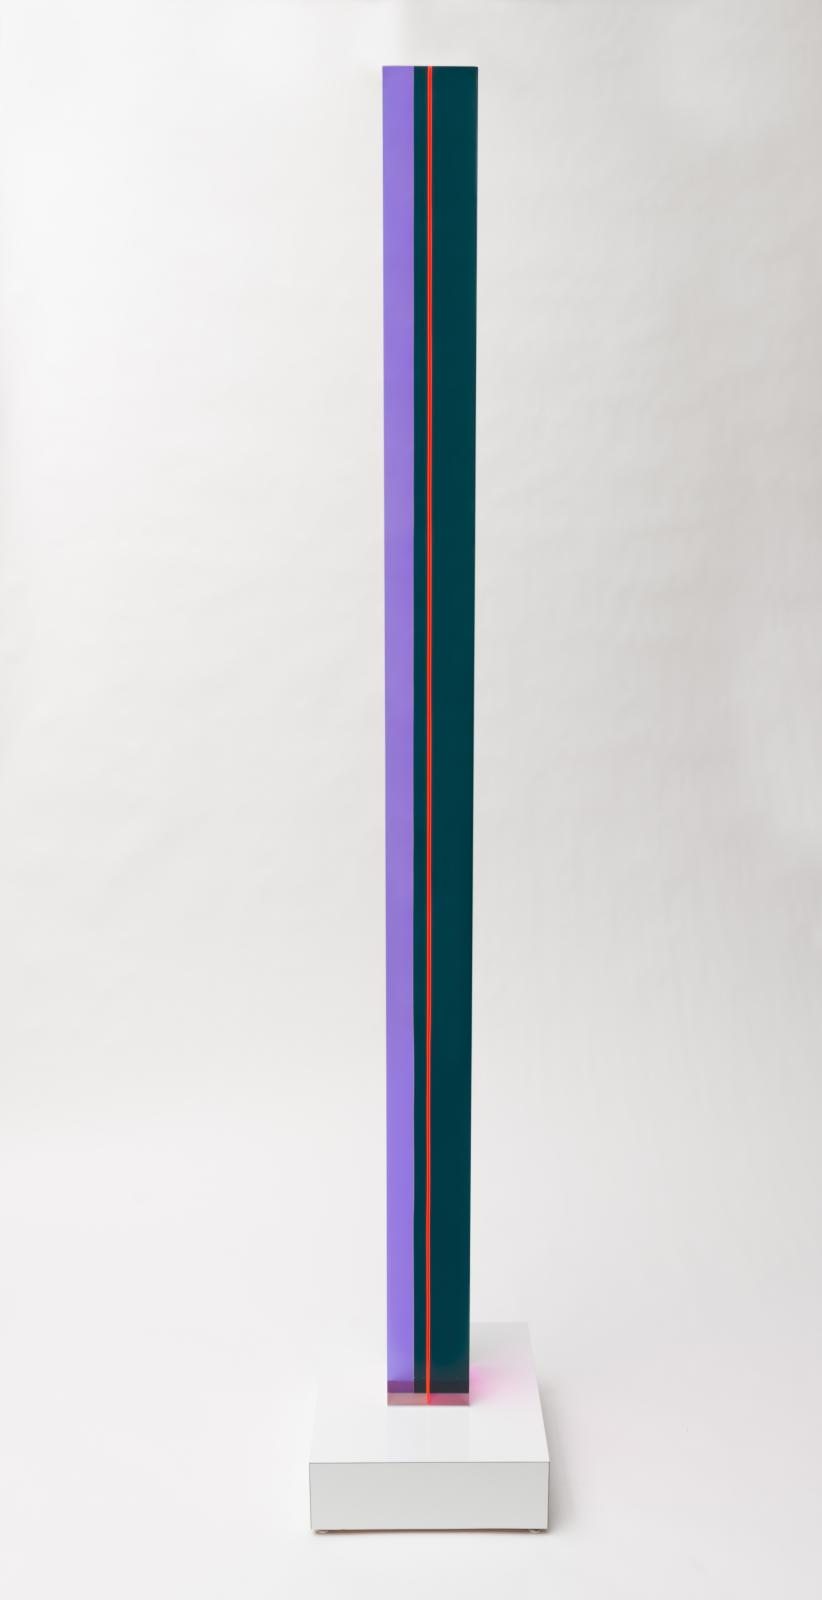 Rectangular Column #2896